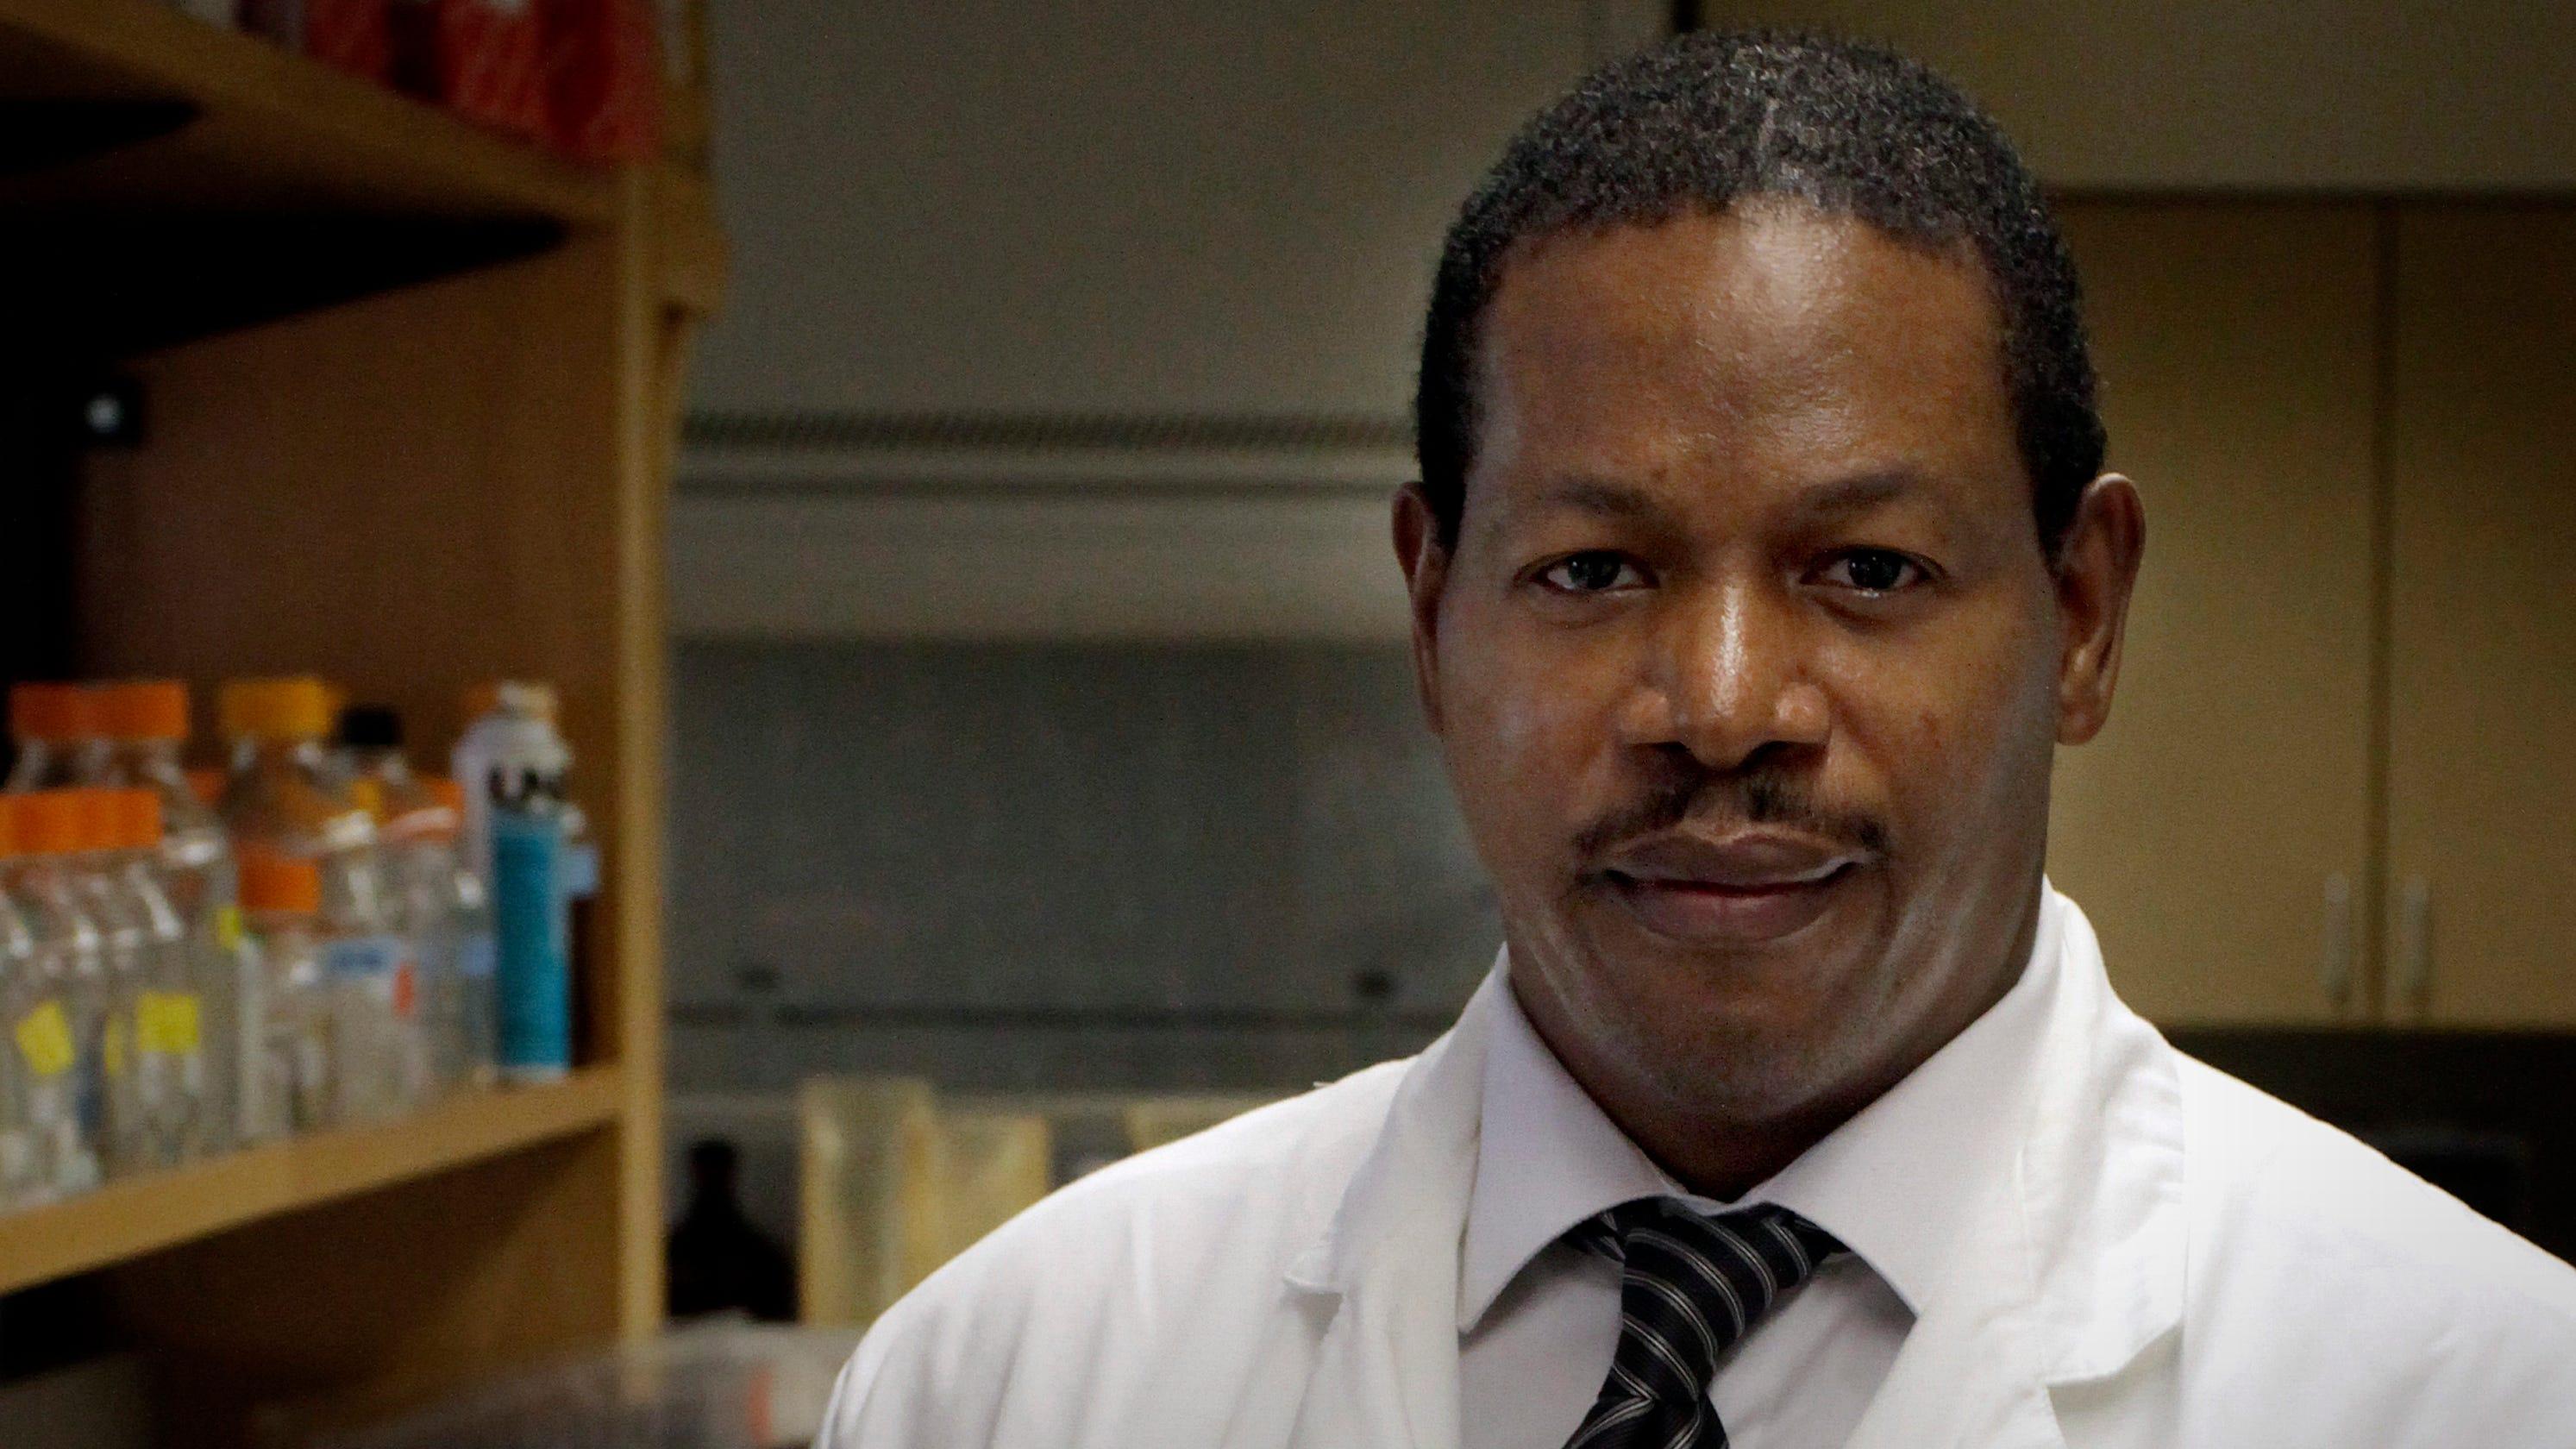 HBCU scientist working on COVID-19 antiviral